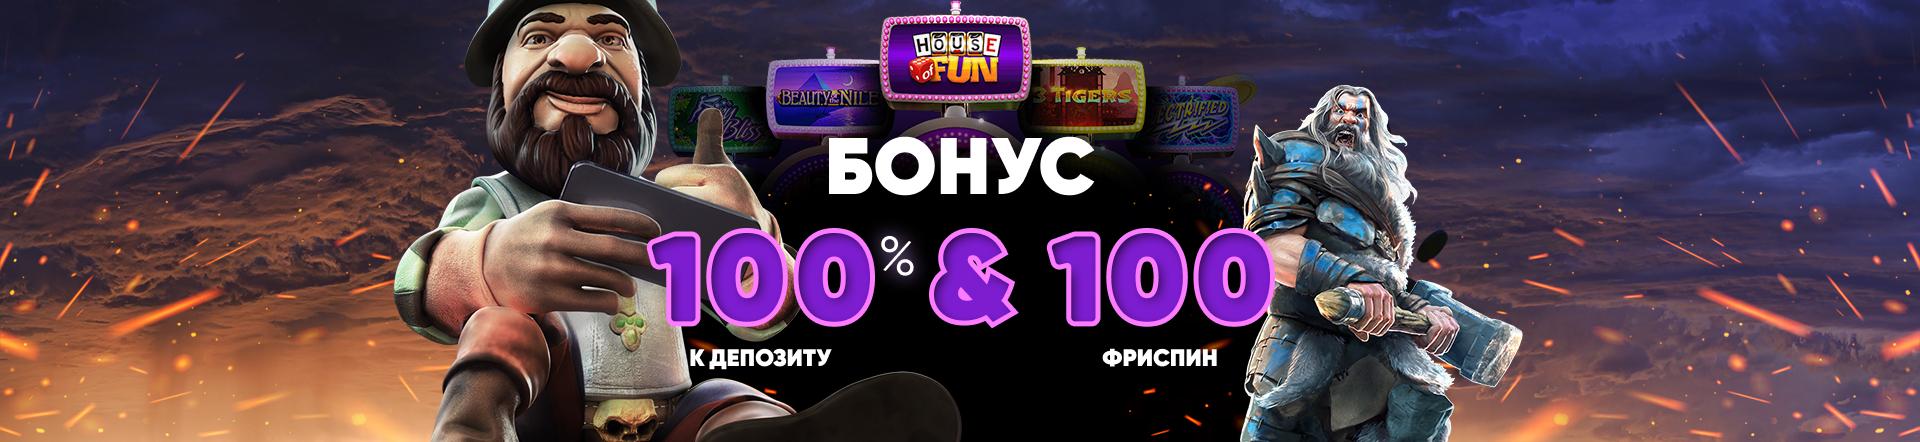 онлайн казино Покерматч